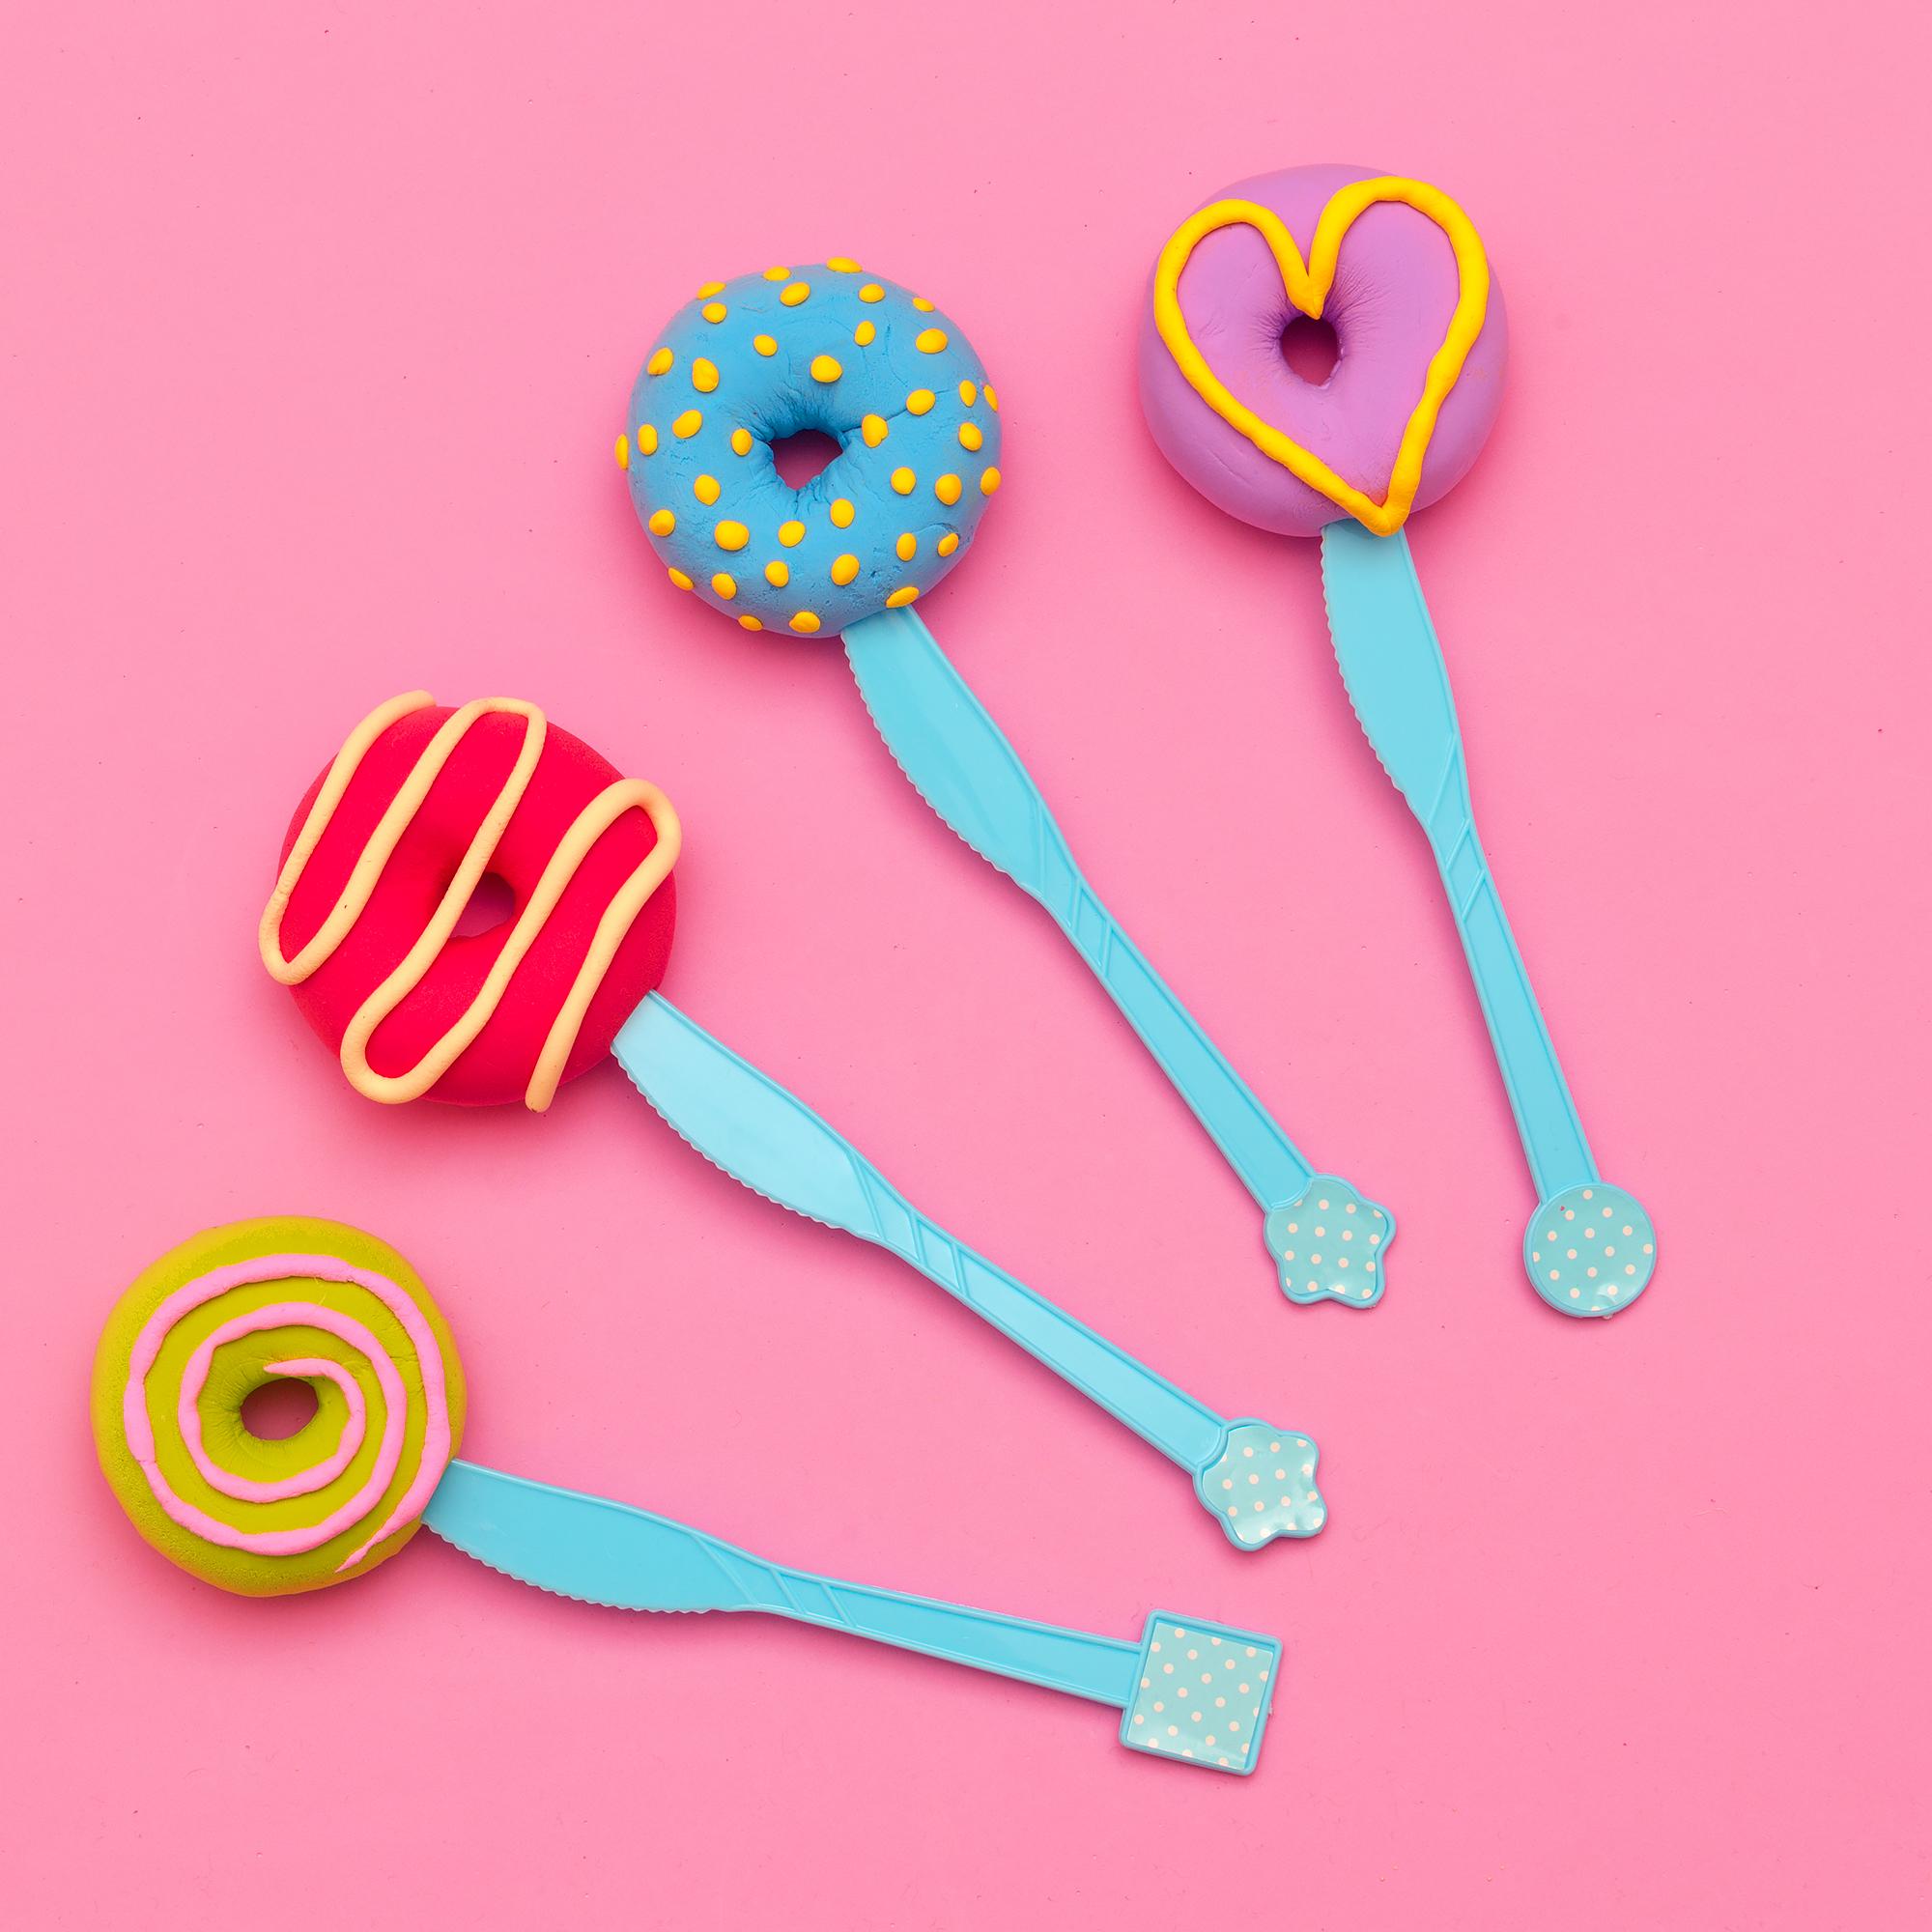 donuts_boringgraphics.JPG